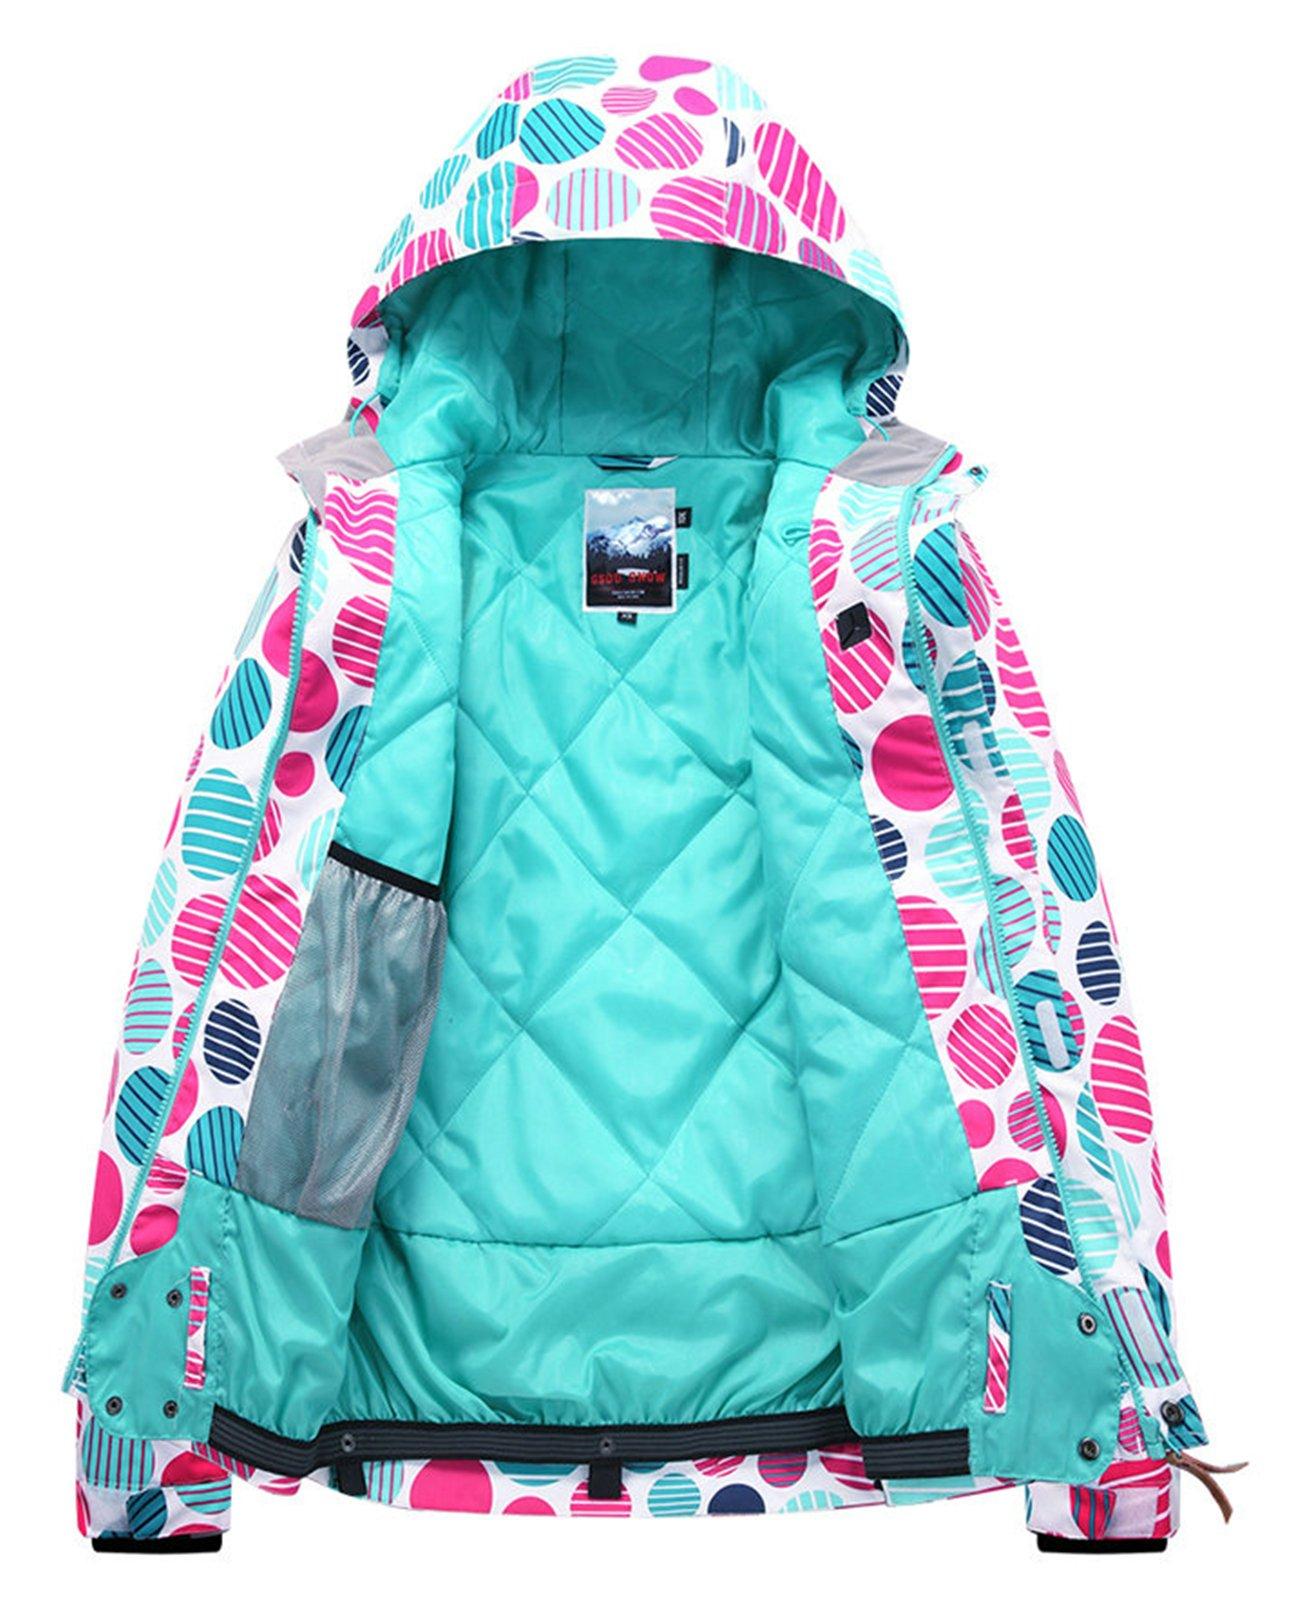 APTRO Women's High Windproof Technology Colorfull Printed Ski Jacket Style #37 Size S by APTRO (Image #3)